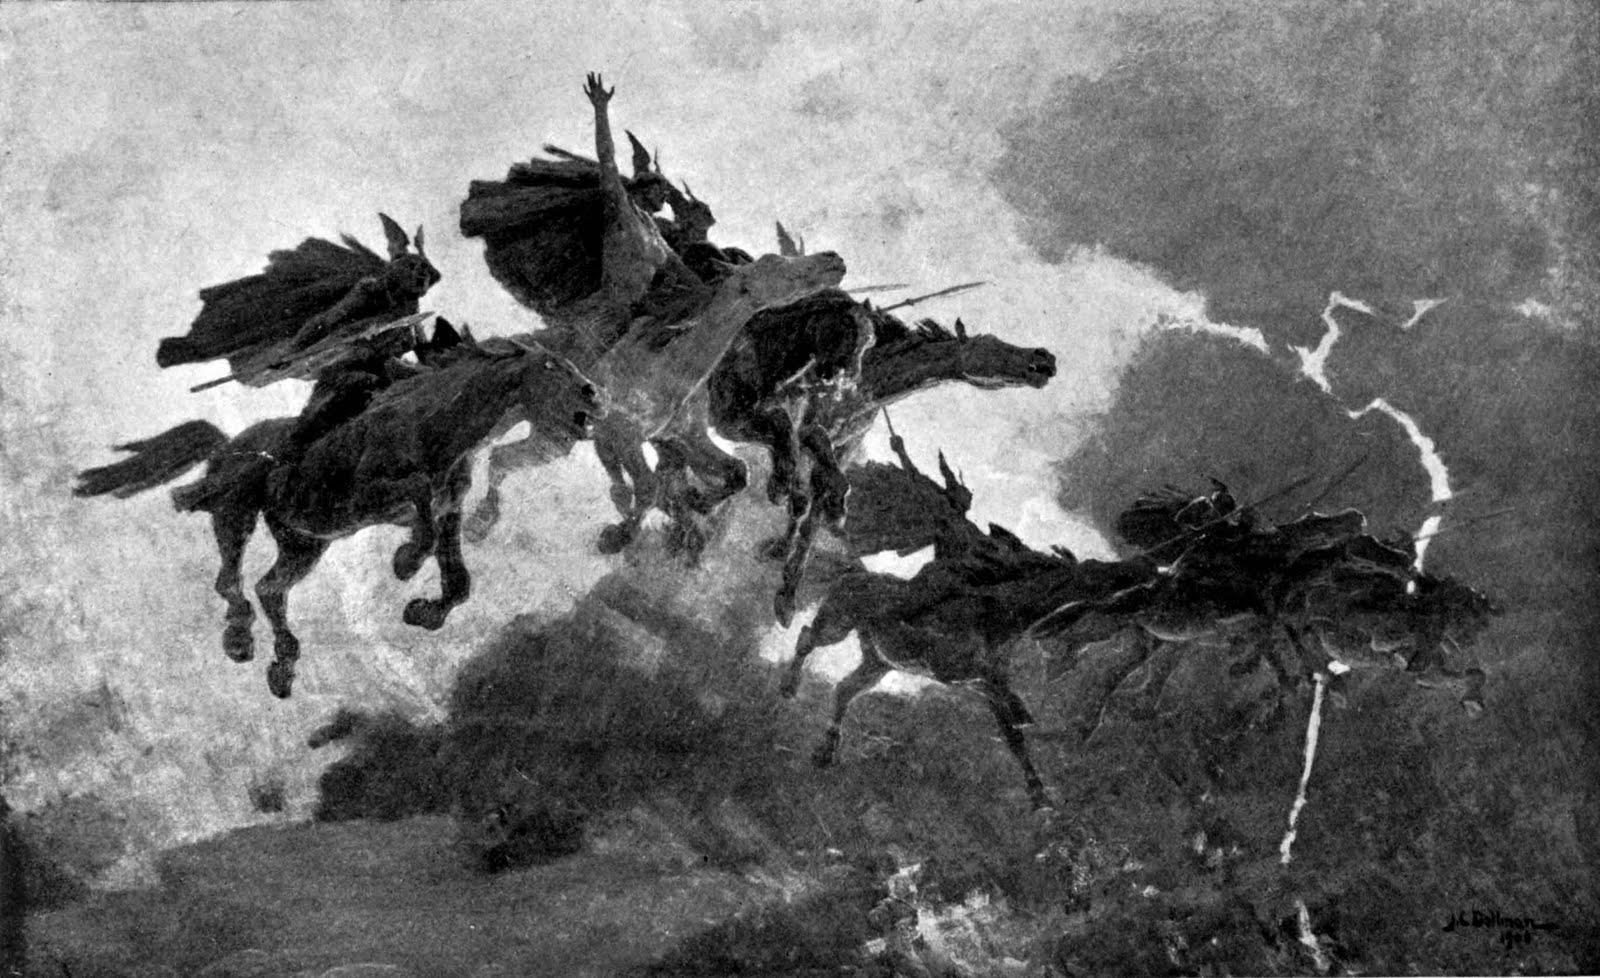 Ride of the valkyries. John Charles Dollman